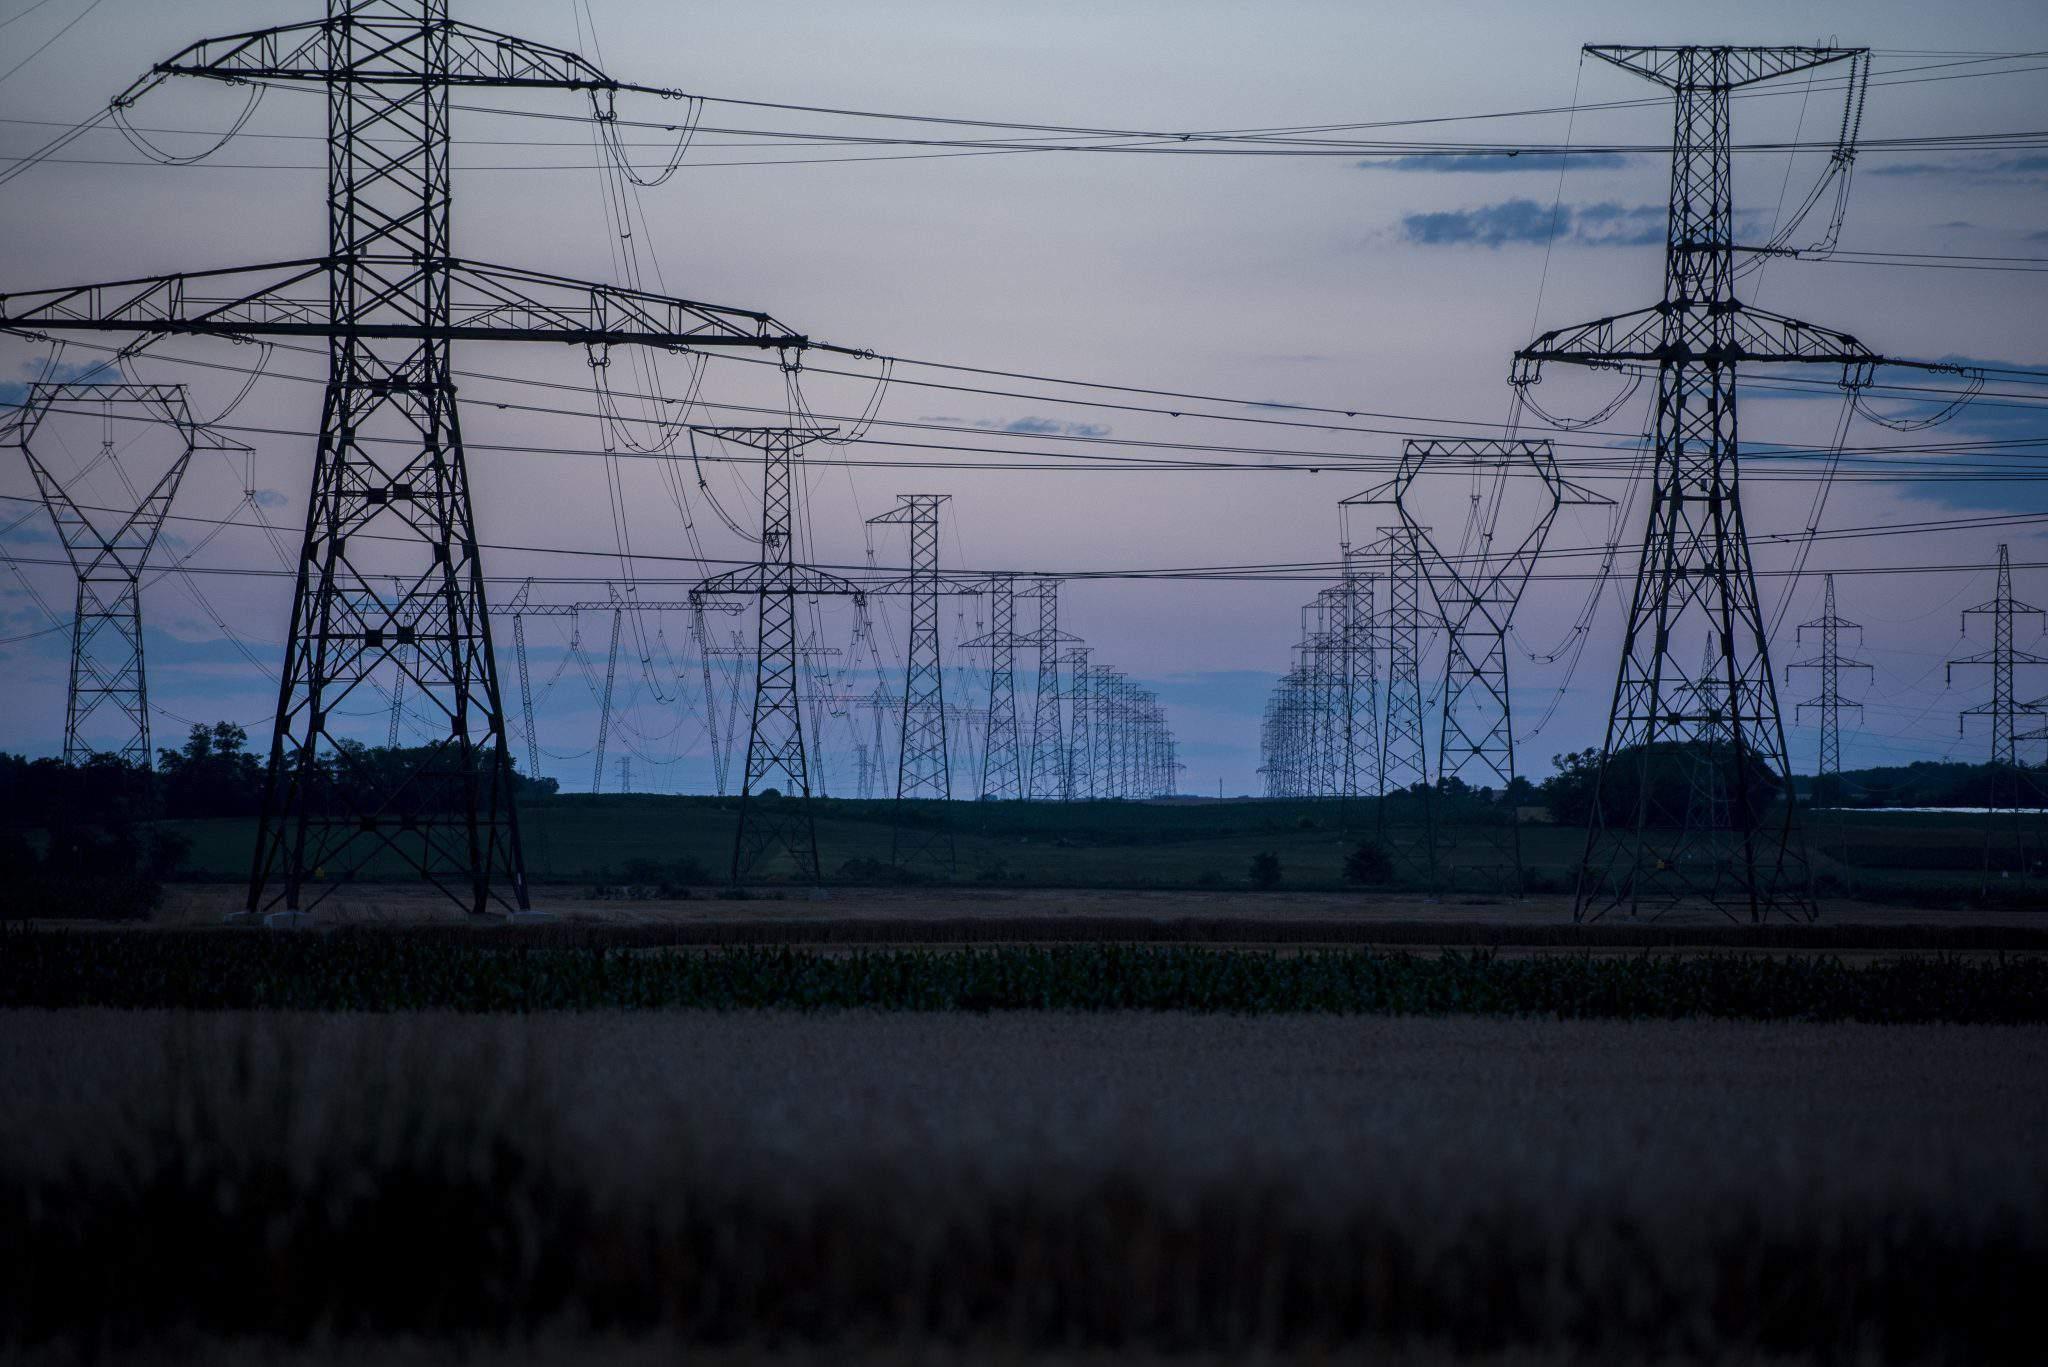 Paks energy electric